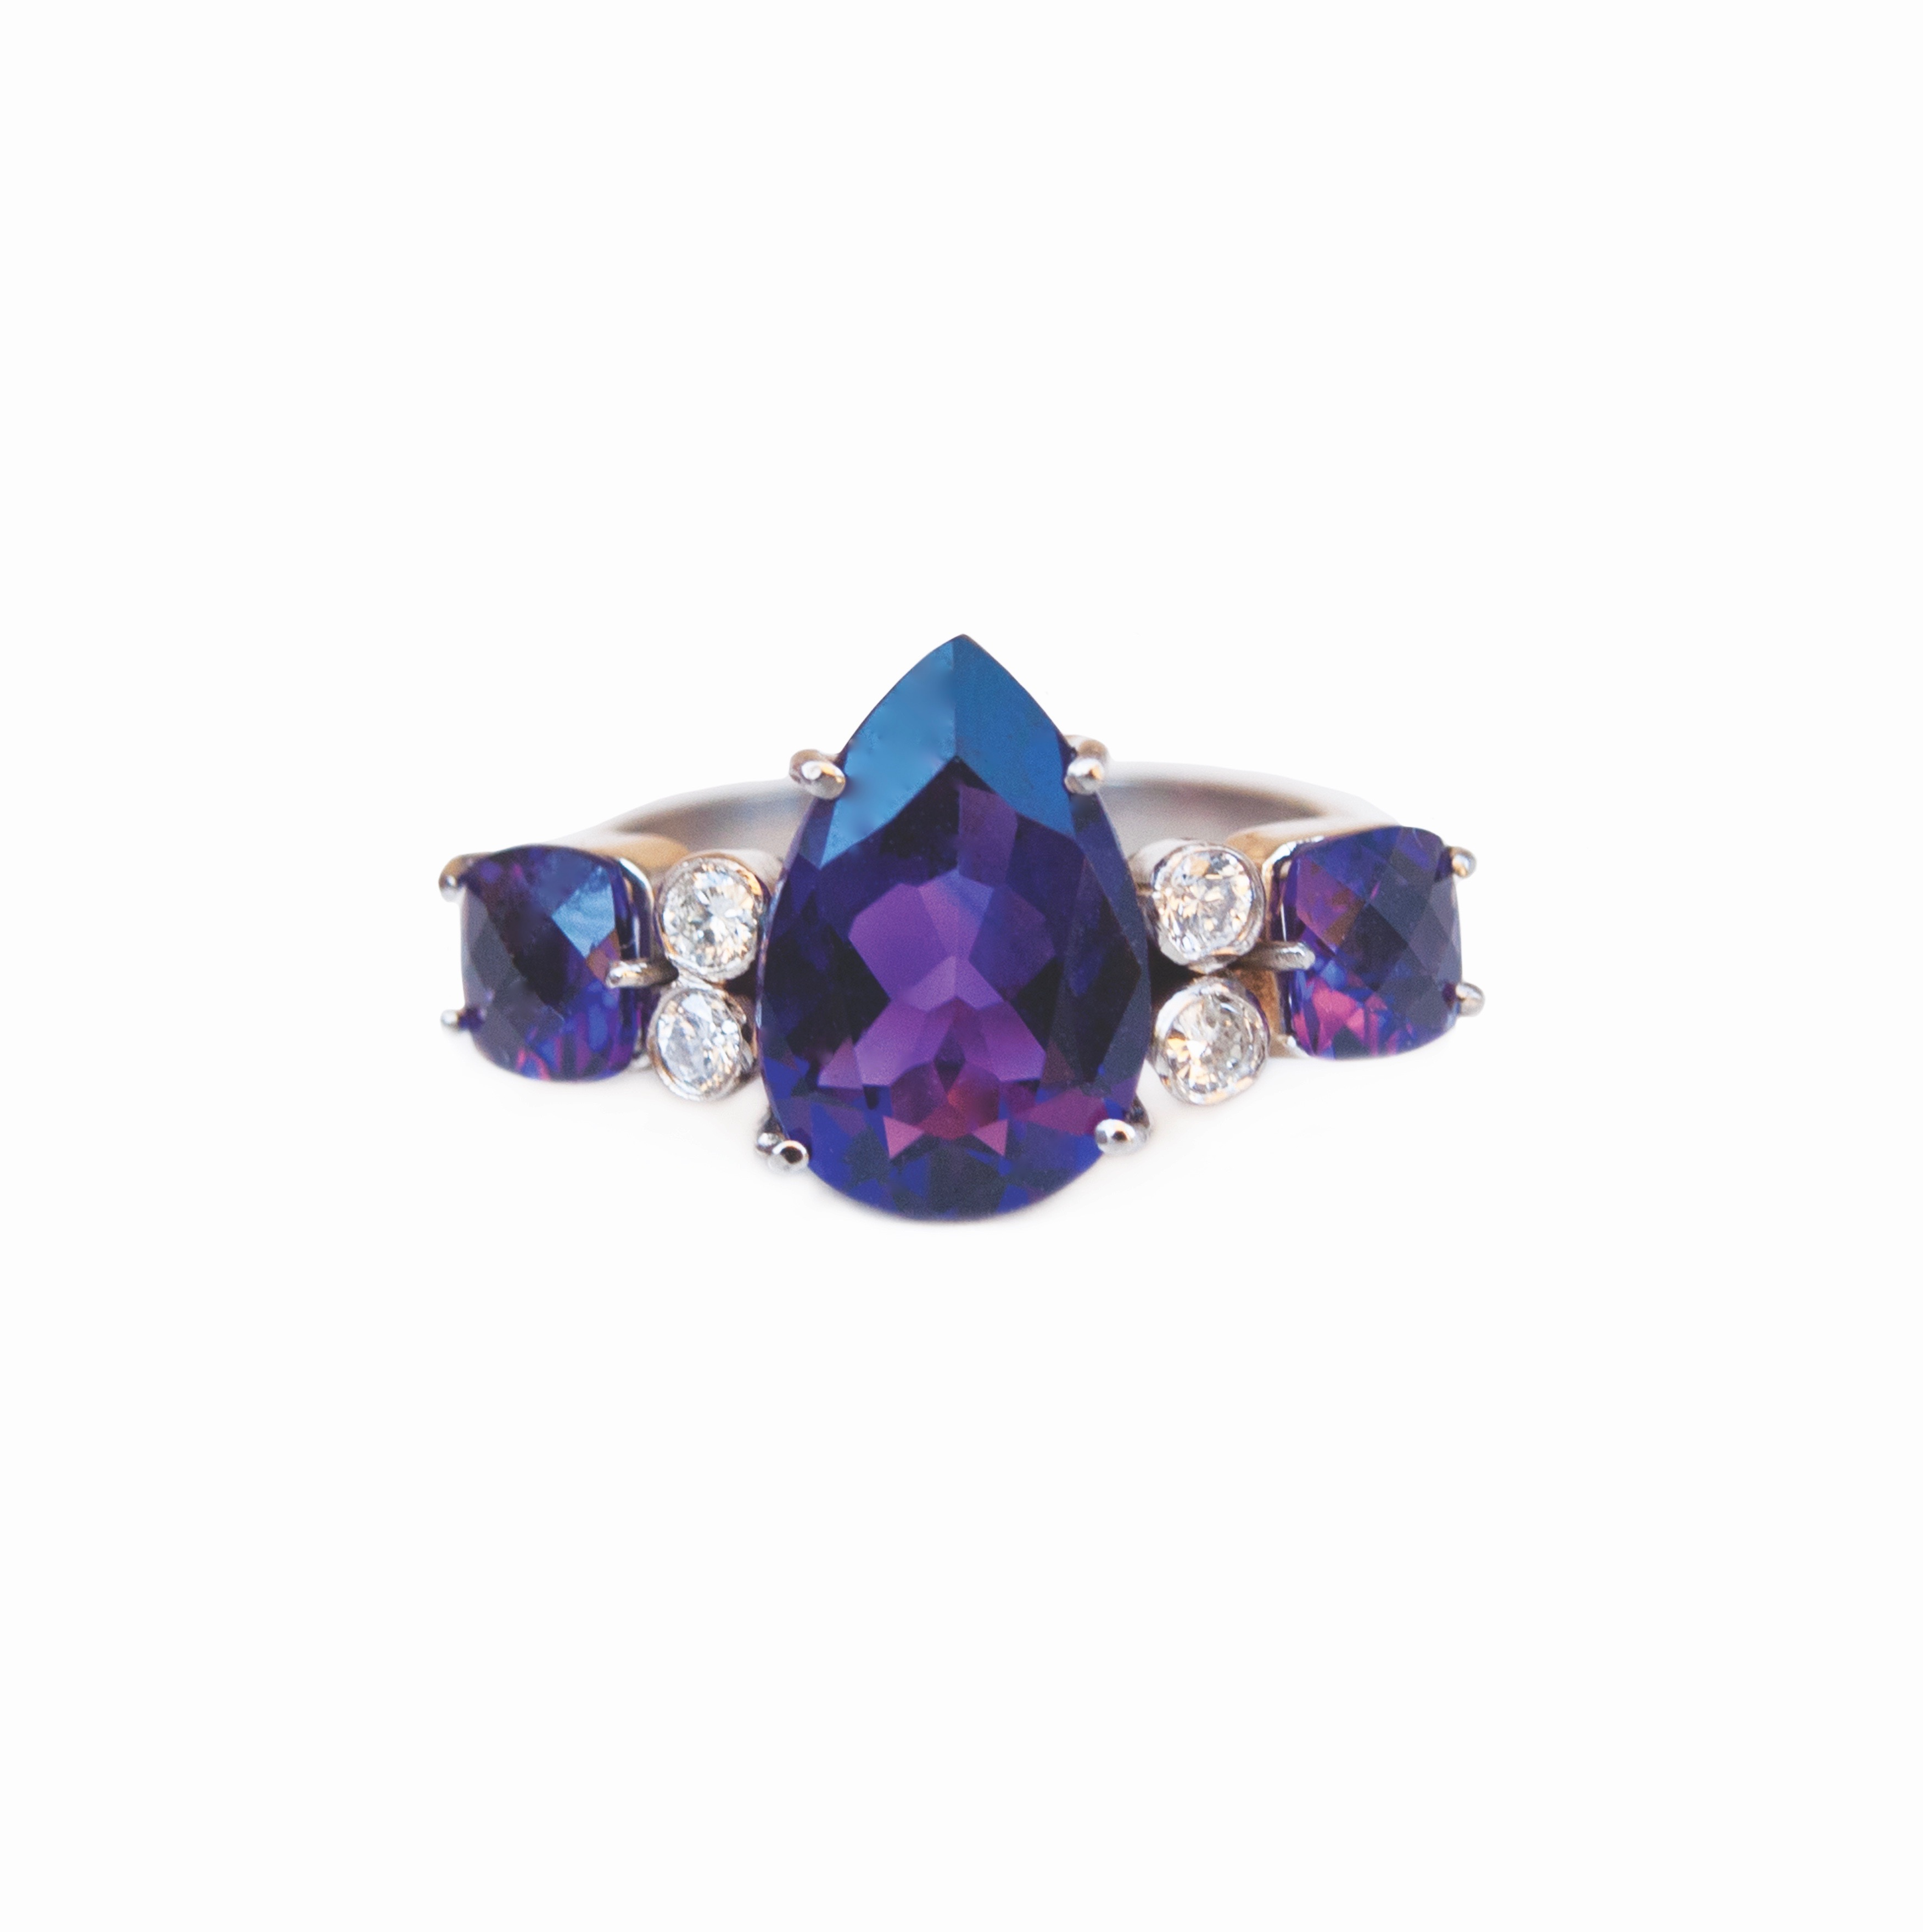 ISABEL ENGLEBERT EMPRESS AMETHYST DIAMOND RING